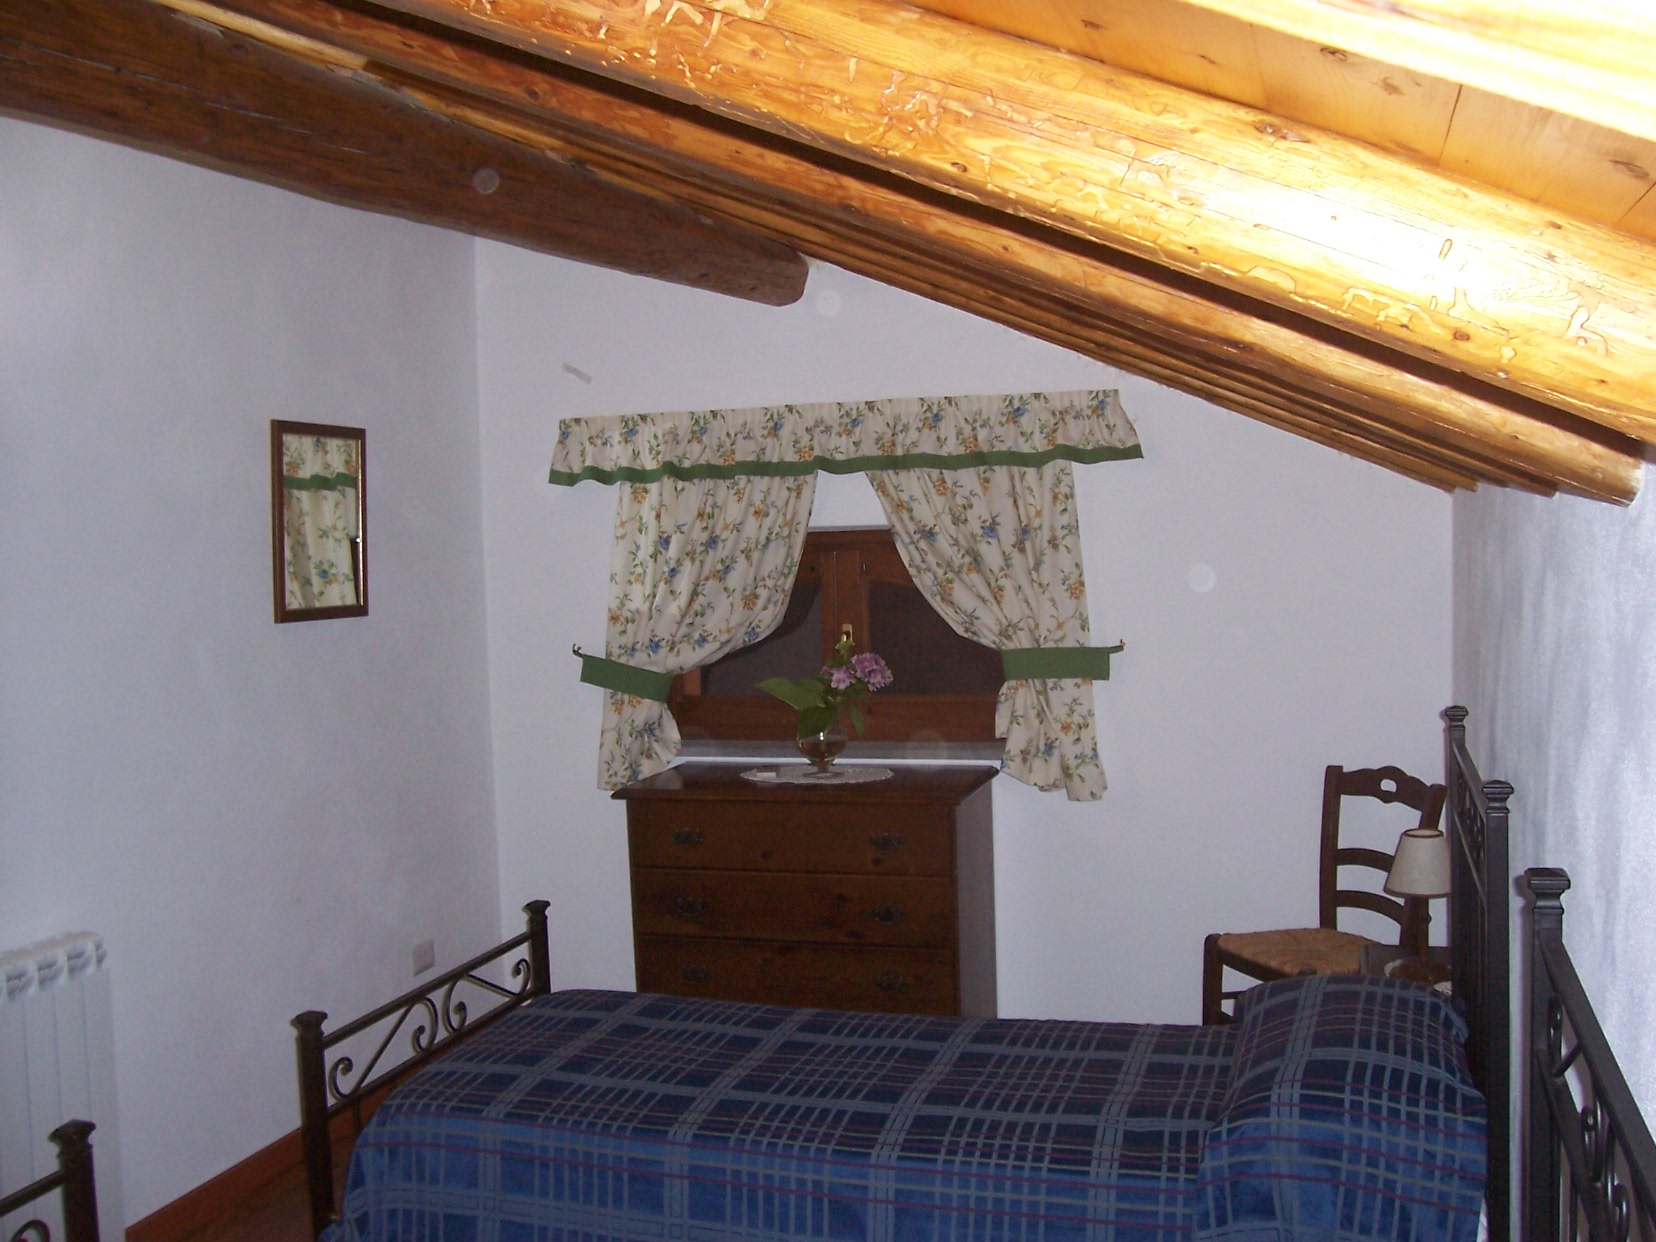 casa club ferienhaus am tna in sizilien f r urlaub mit hund. Black Bedroom Furniture Sets. Home Design Ideas